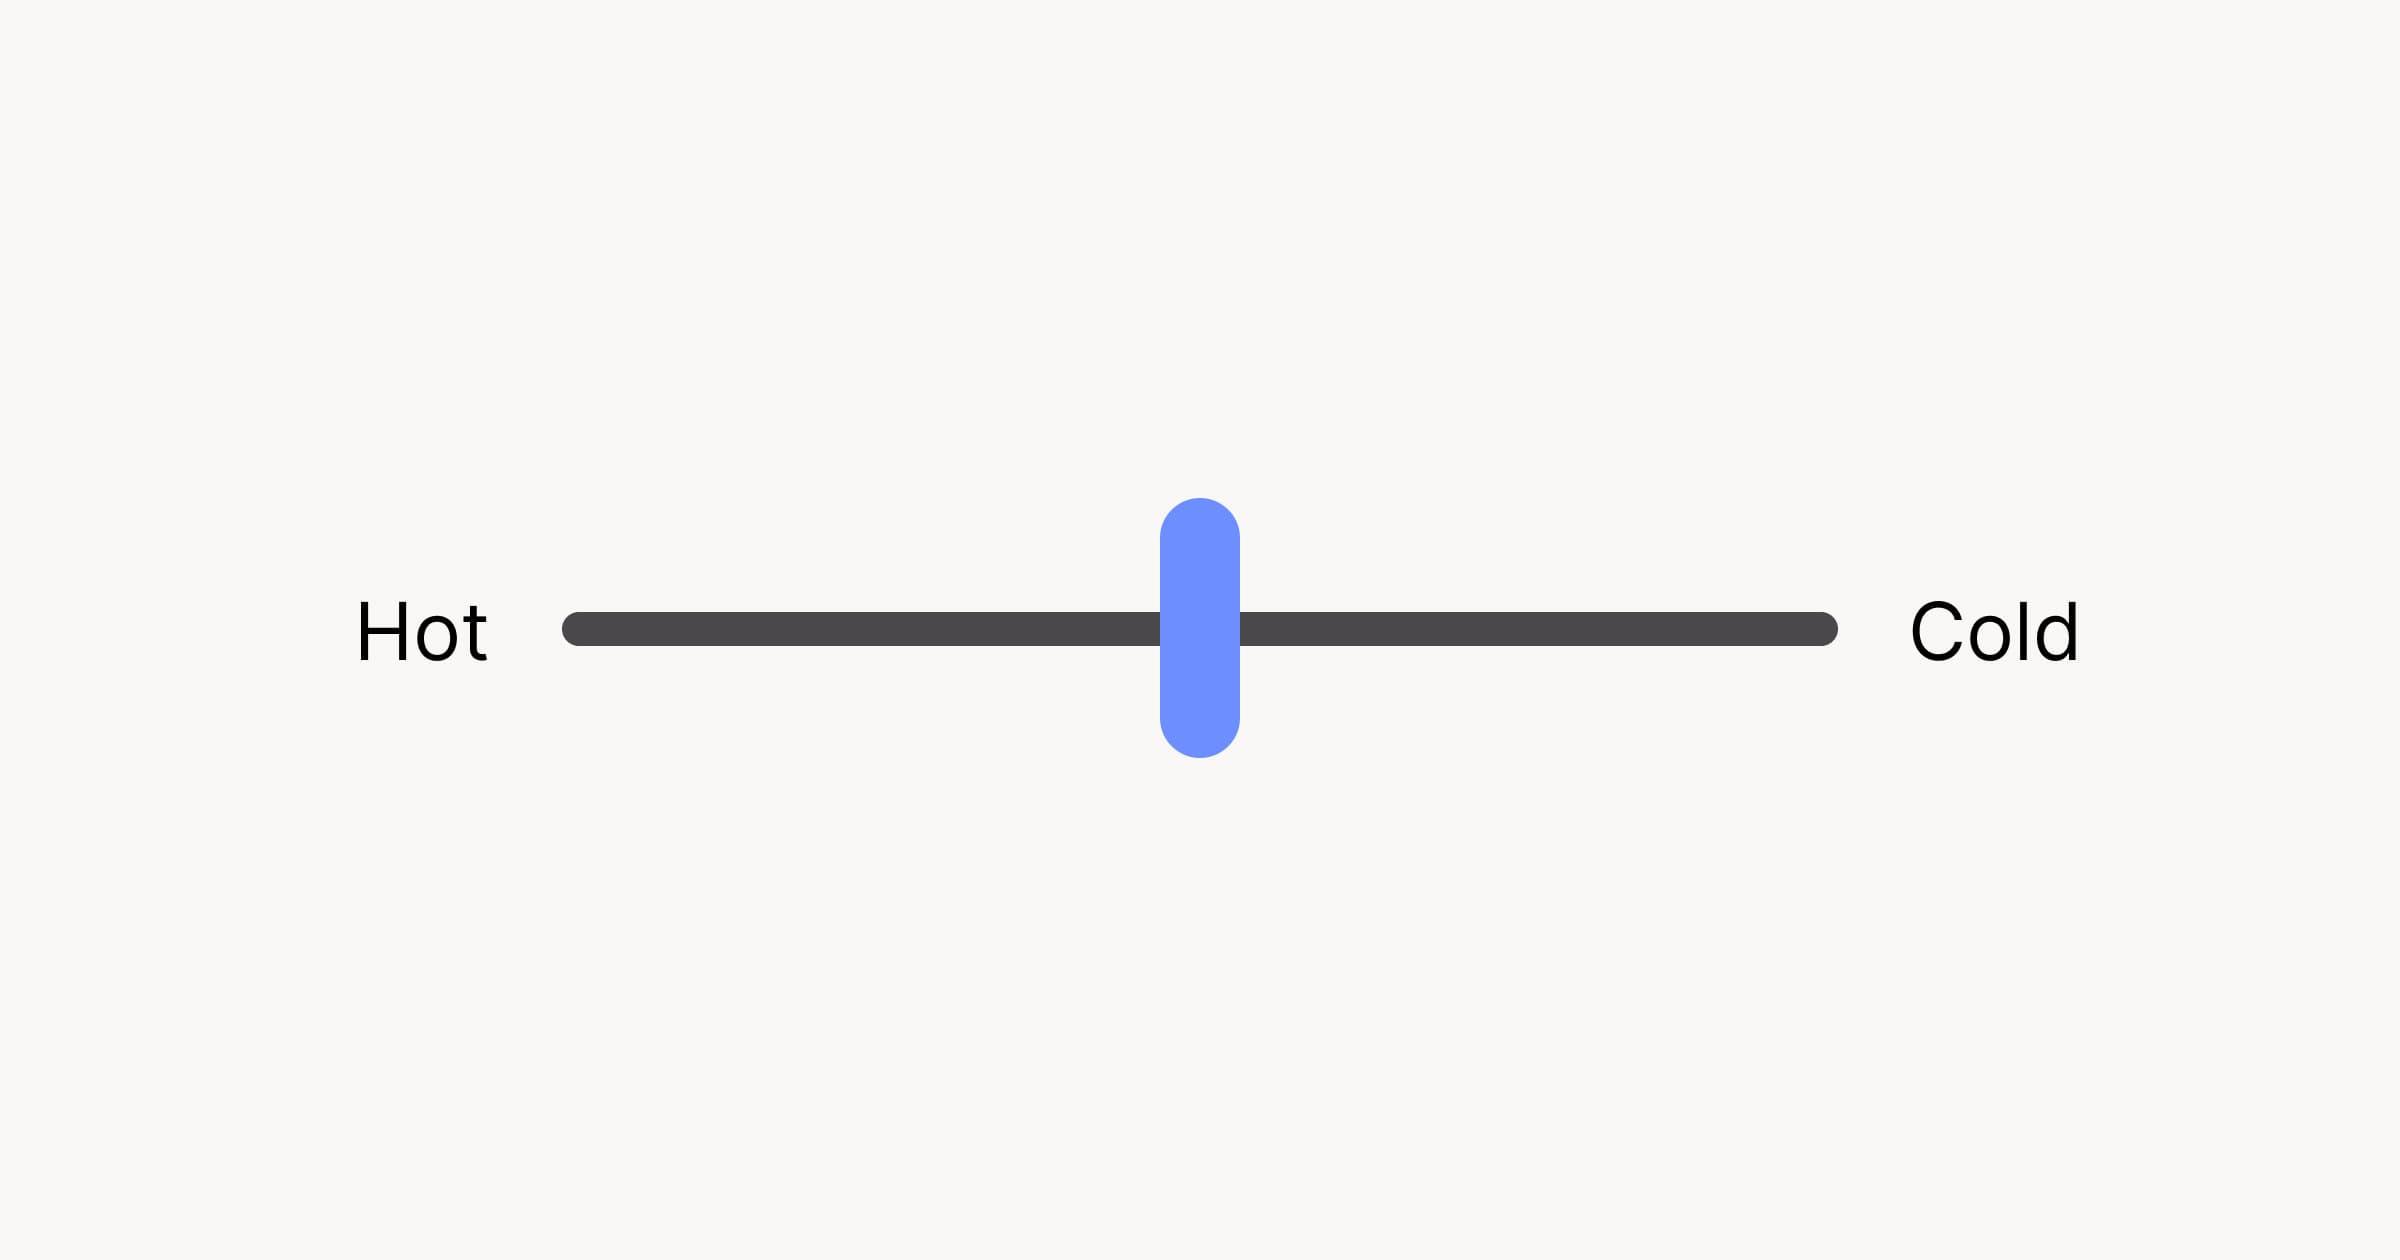 An example of a range input